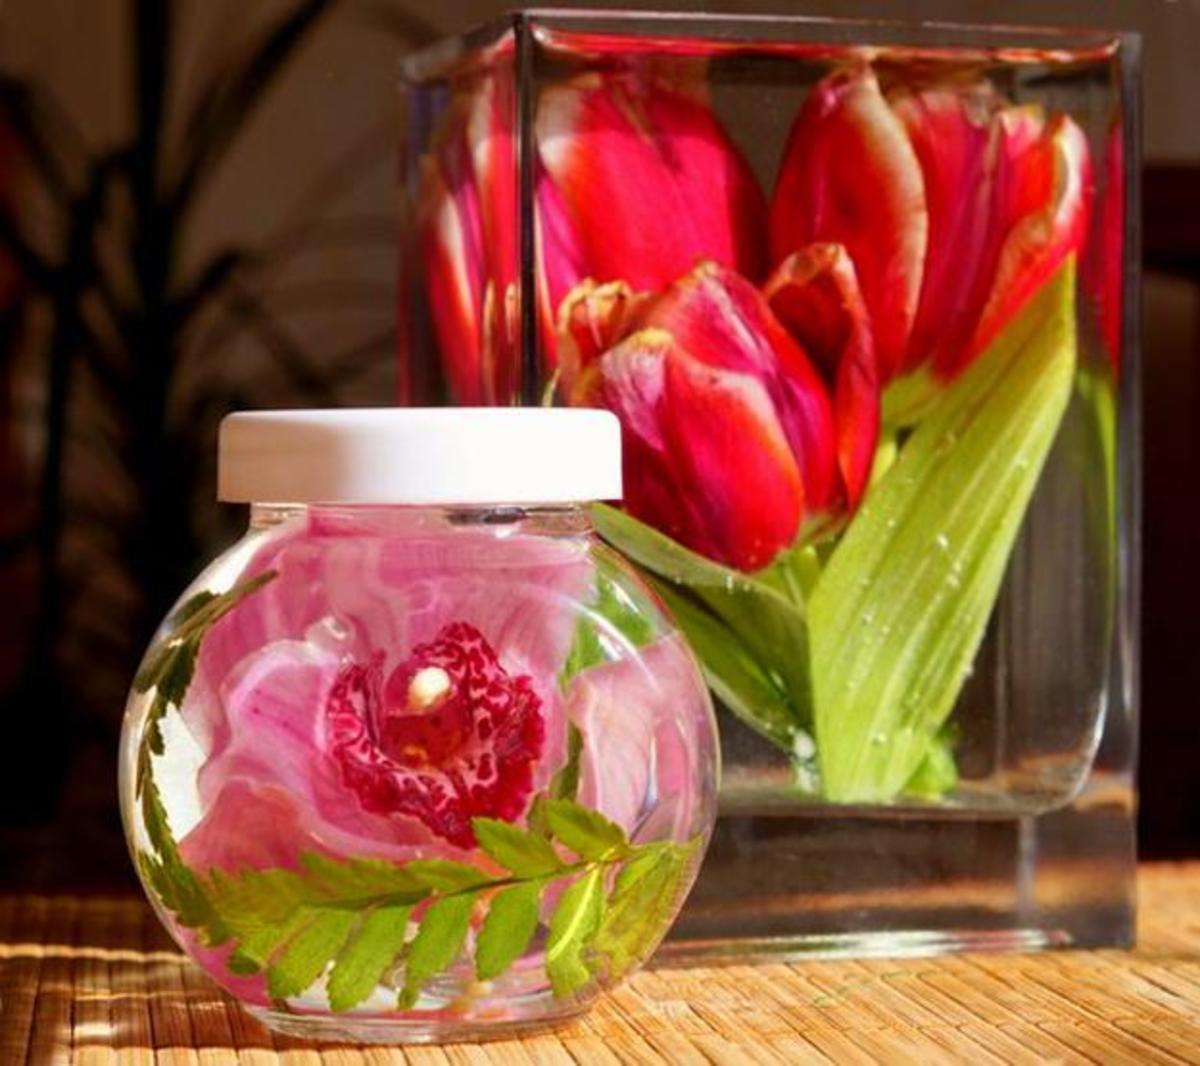 Flowers preserved in glycerin